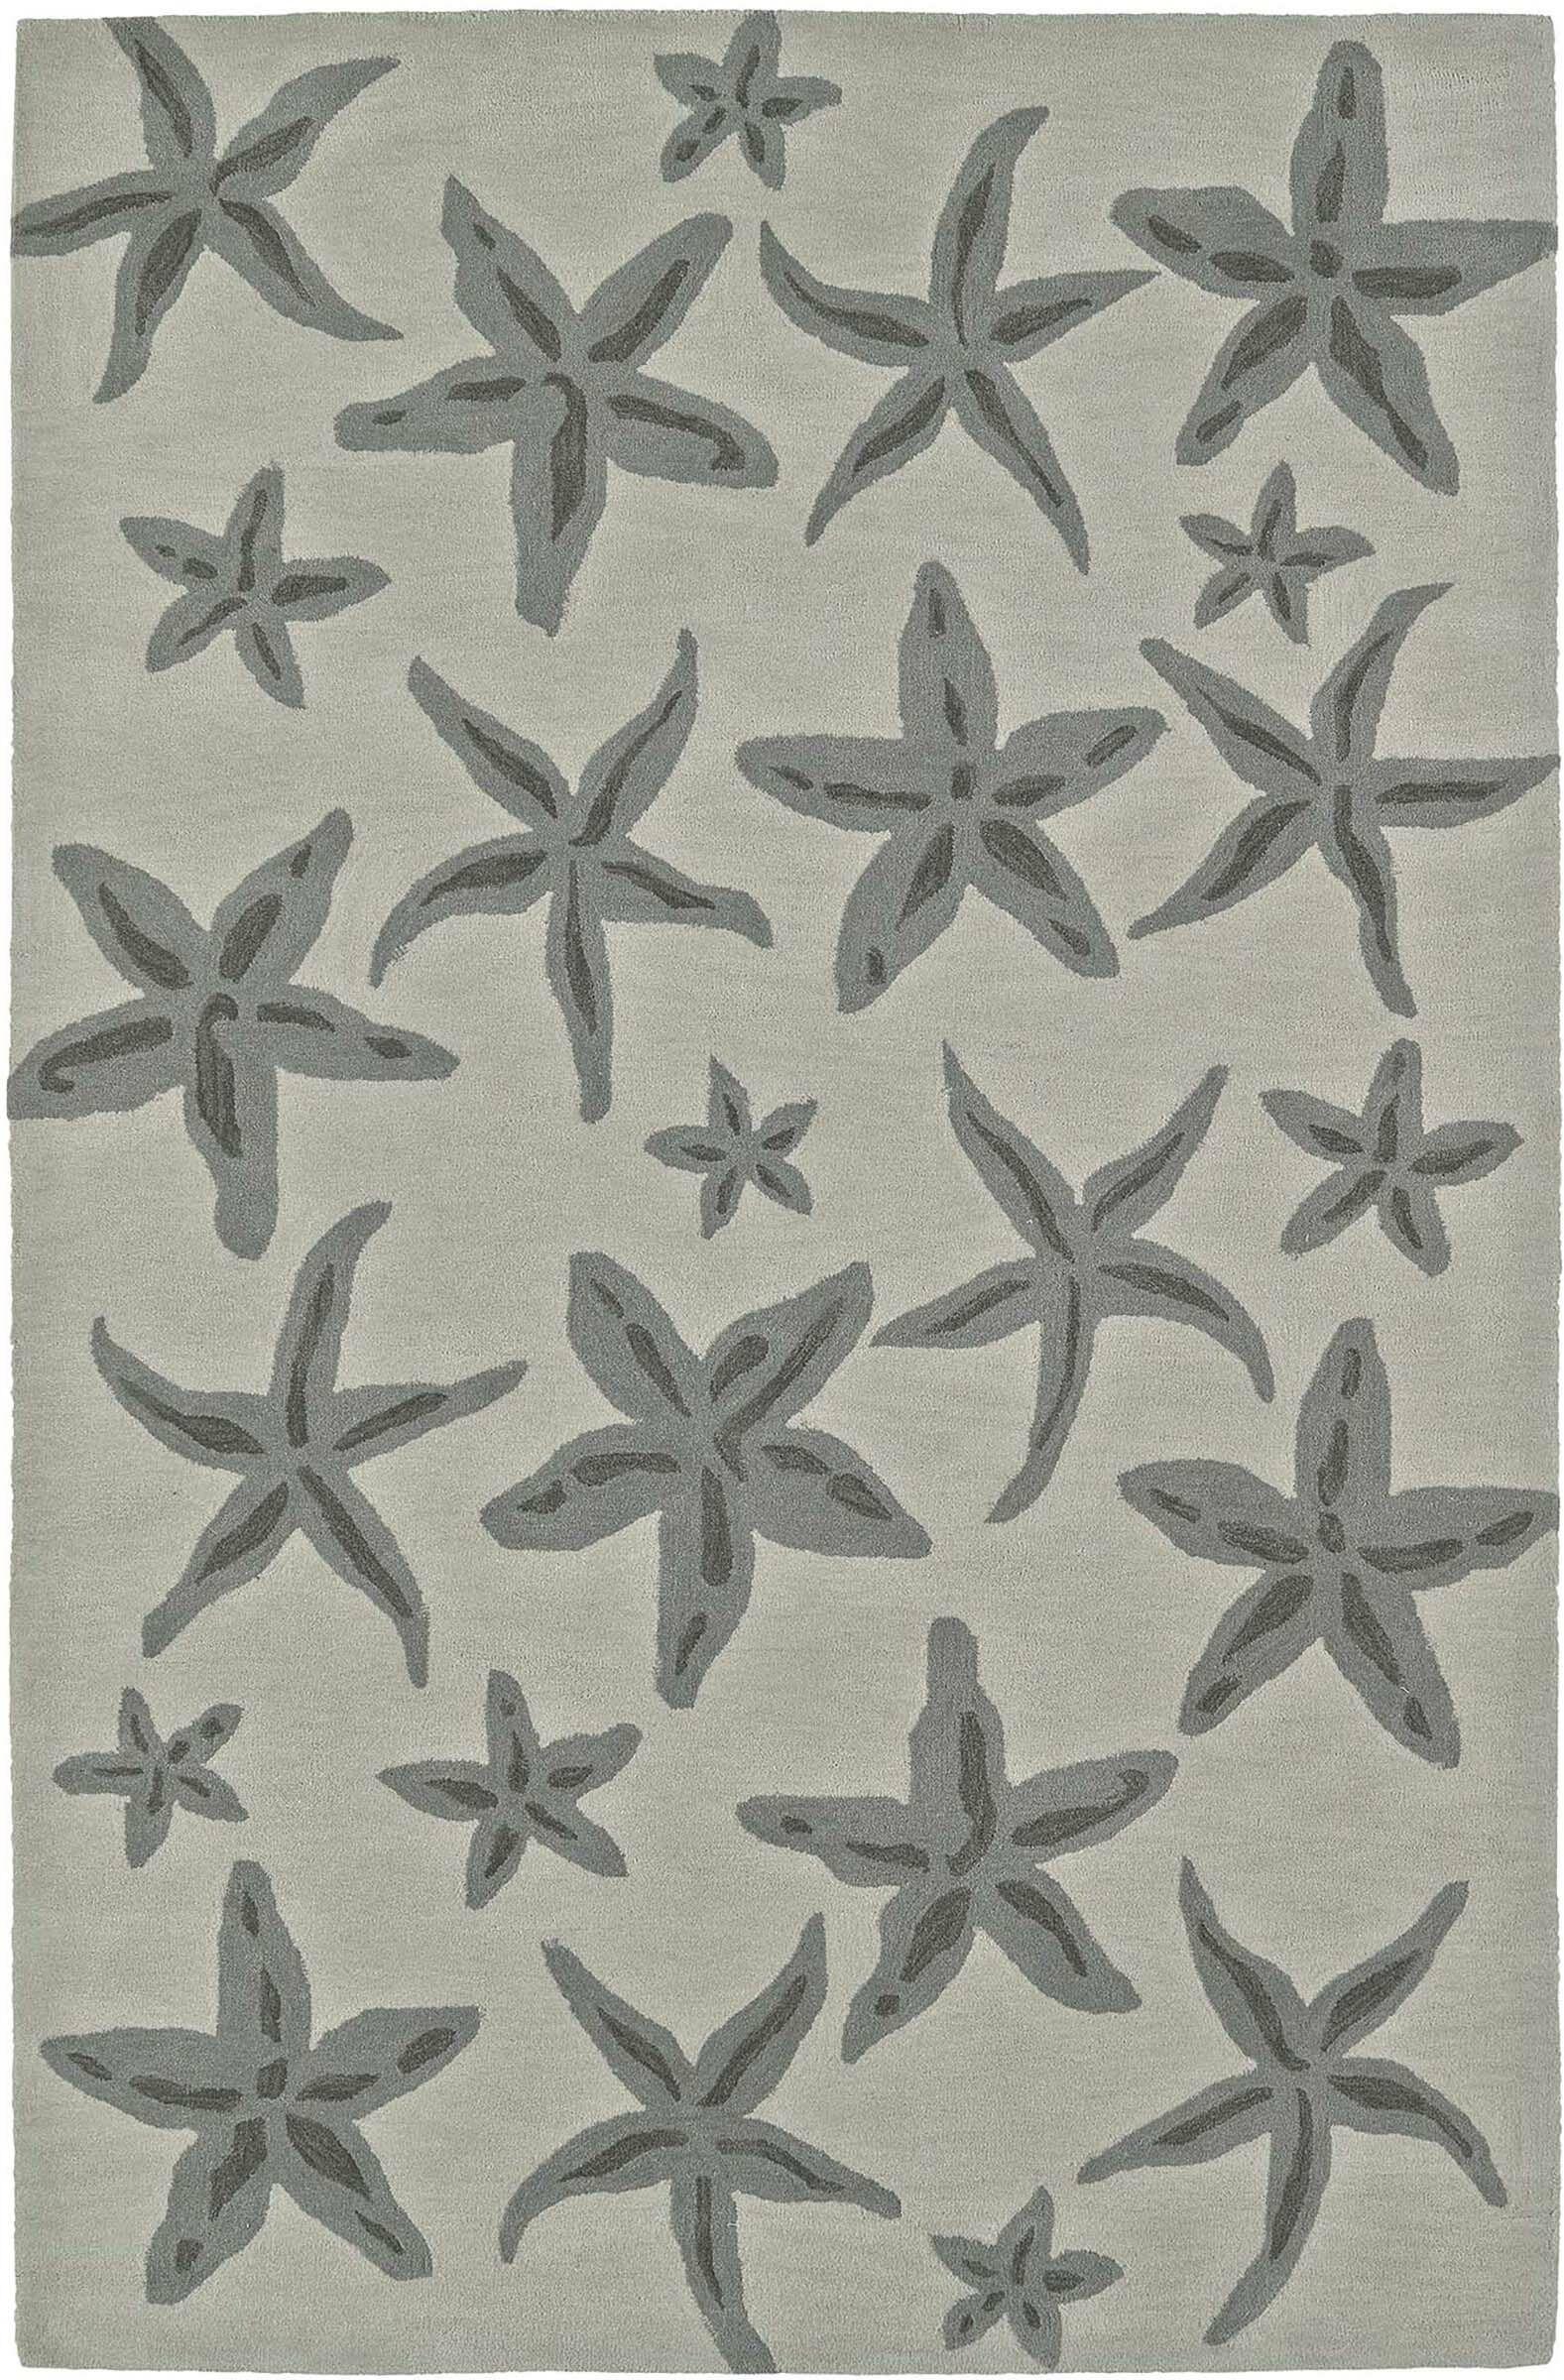 Bovina Hand-Tufted Linen Area Rug Rug Size: Rectangle 3'6